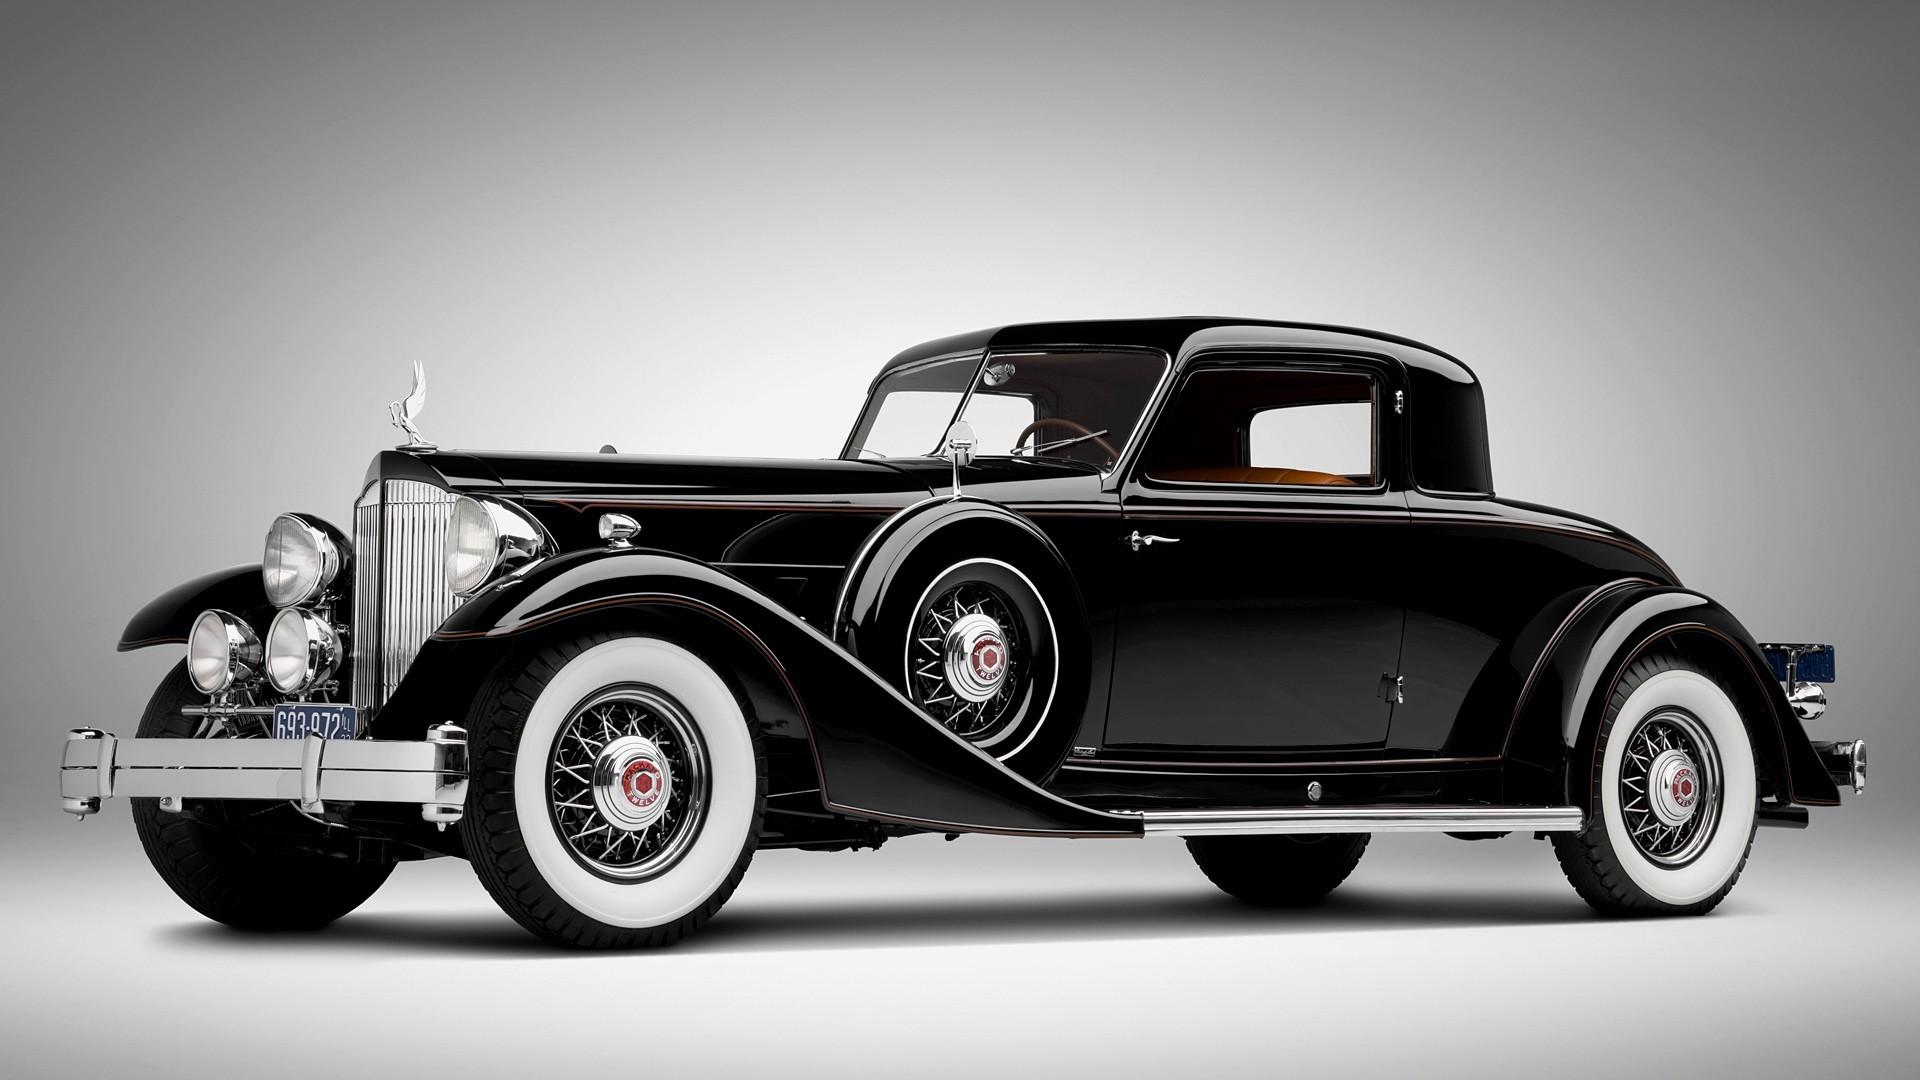 Autos Clásicos, Excelente. Art DecoAntique CarsOld …